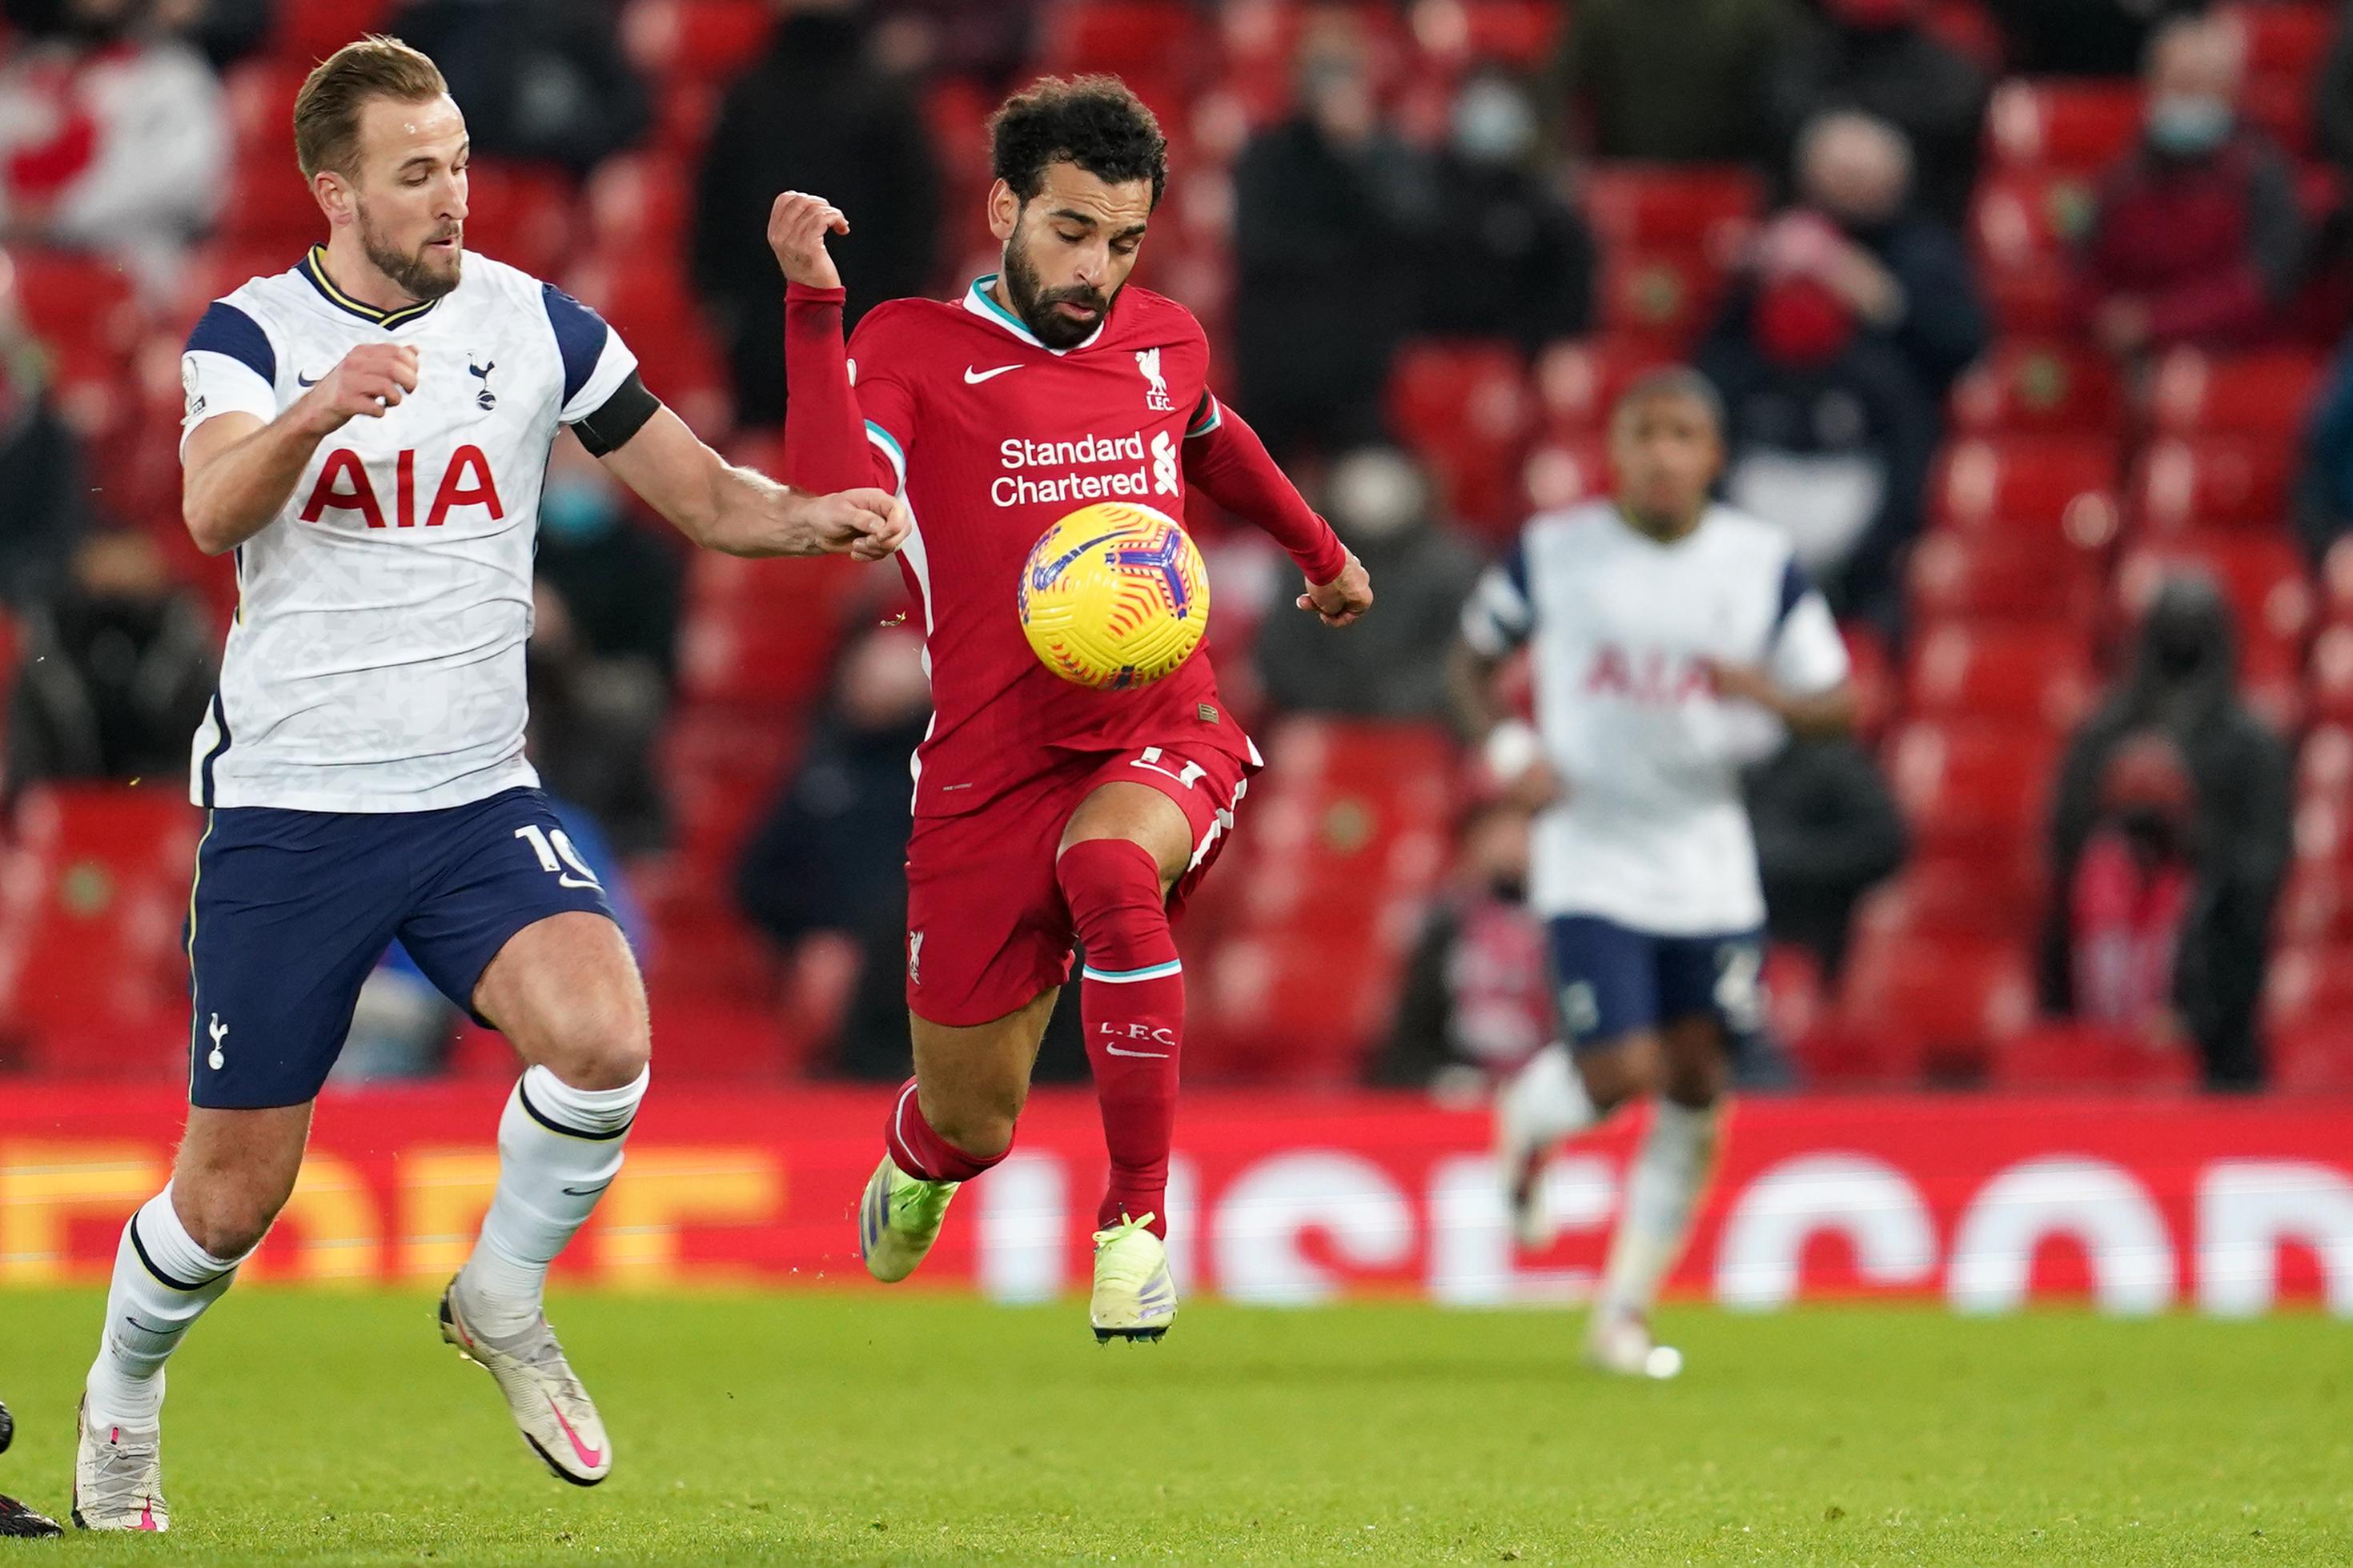 Harry Kane vies for the ball with Mohamed Salah - Liverpool vs Tottenham - Premier League